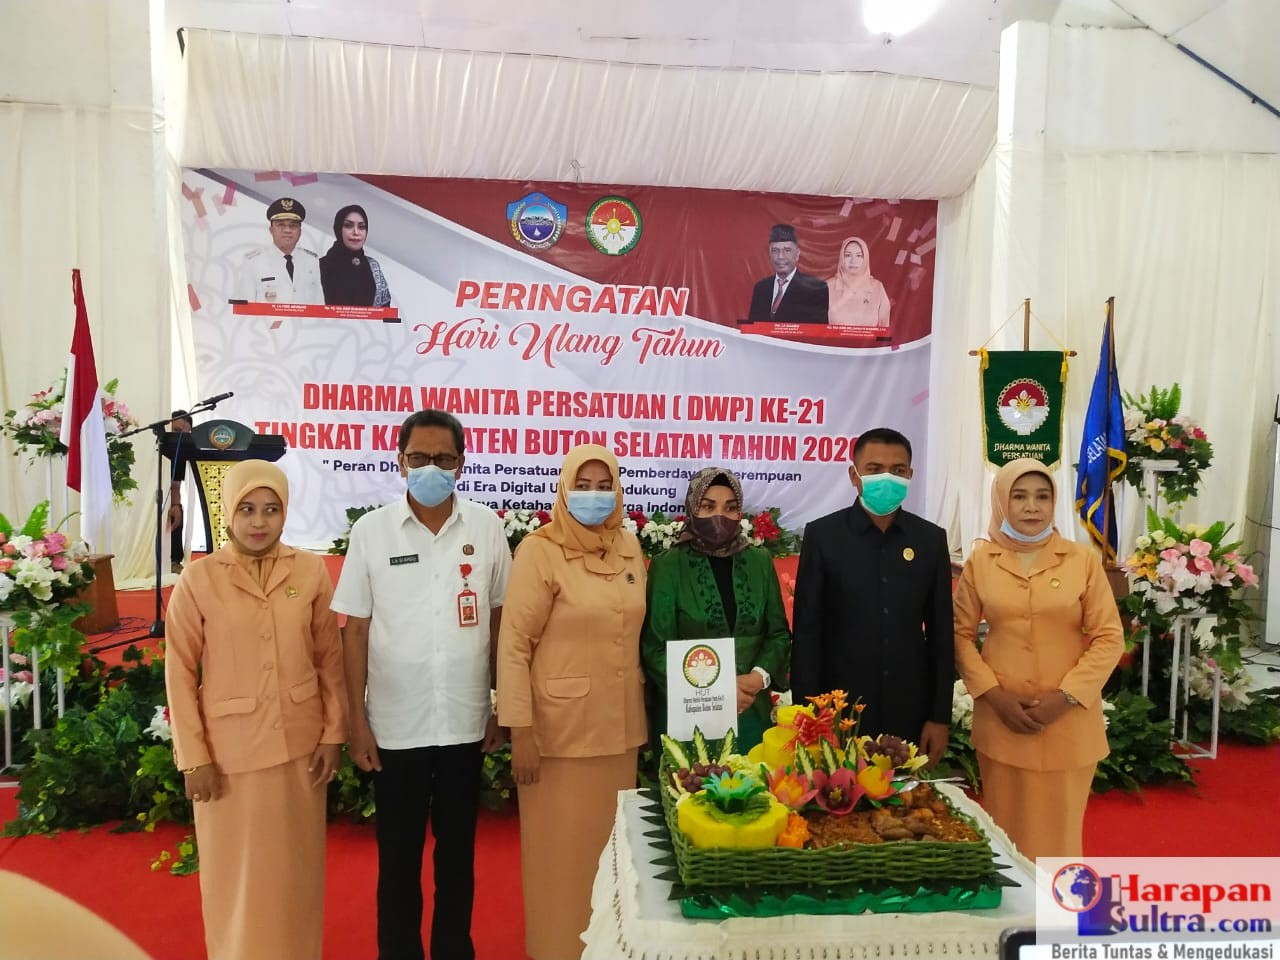 Foto Bersama usai pelaksanaan HUT DWP Kabupaten Busel